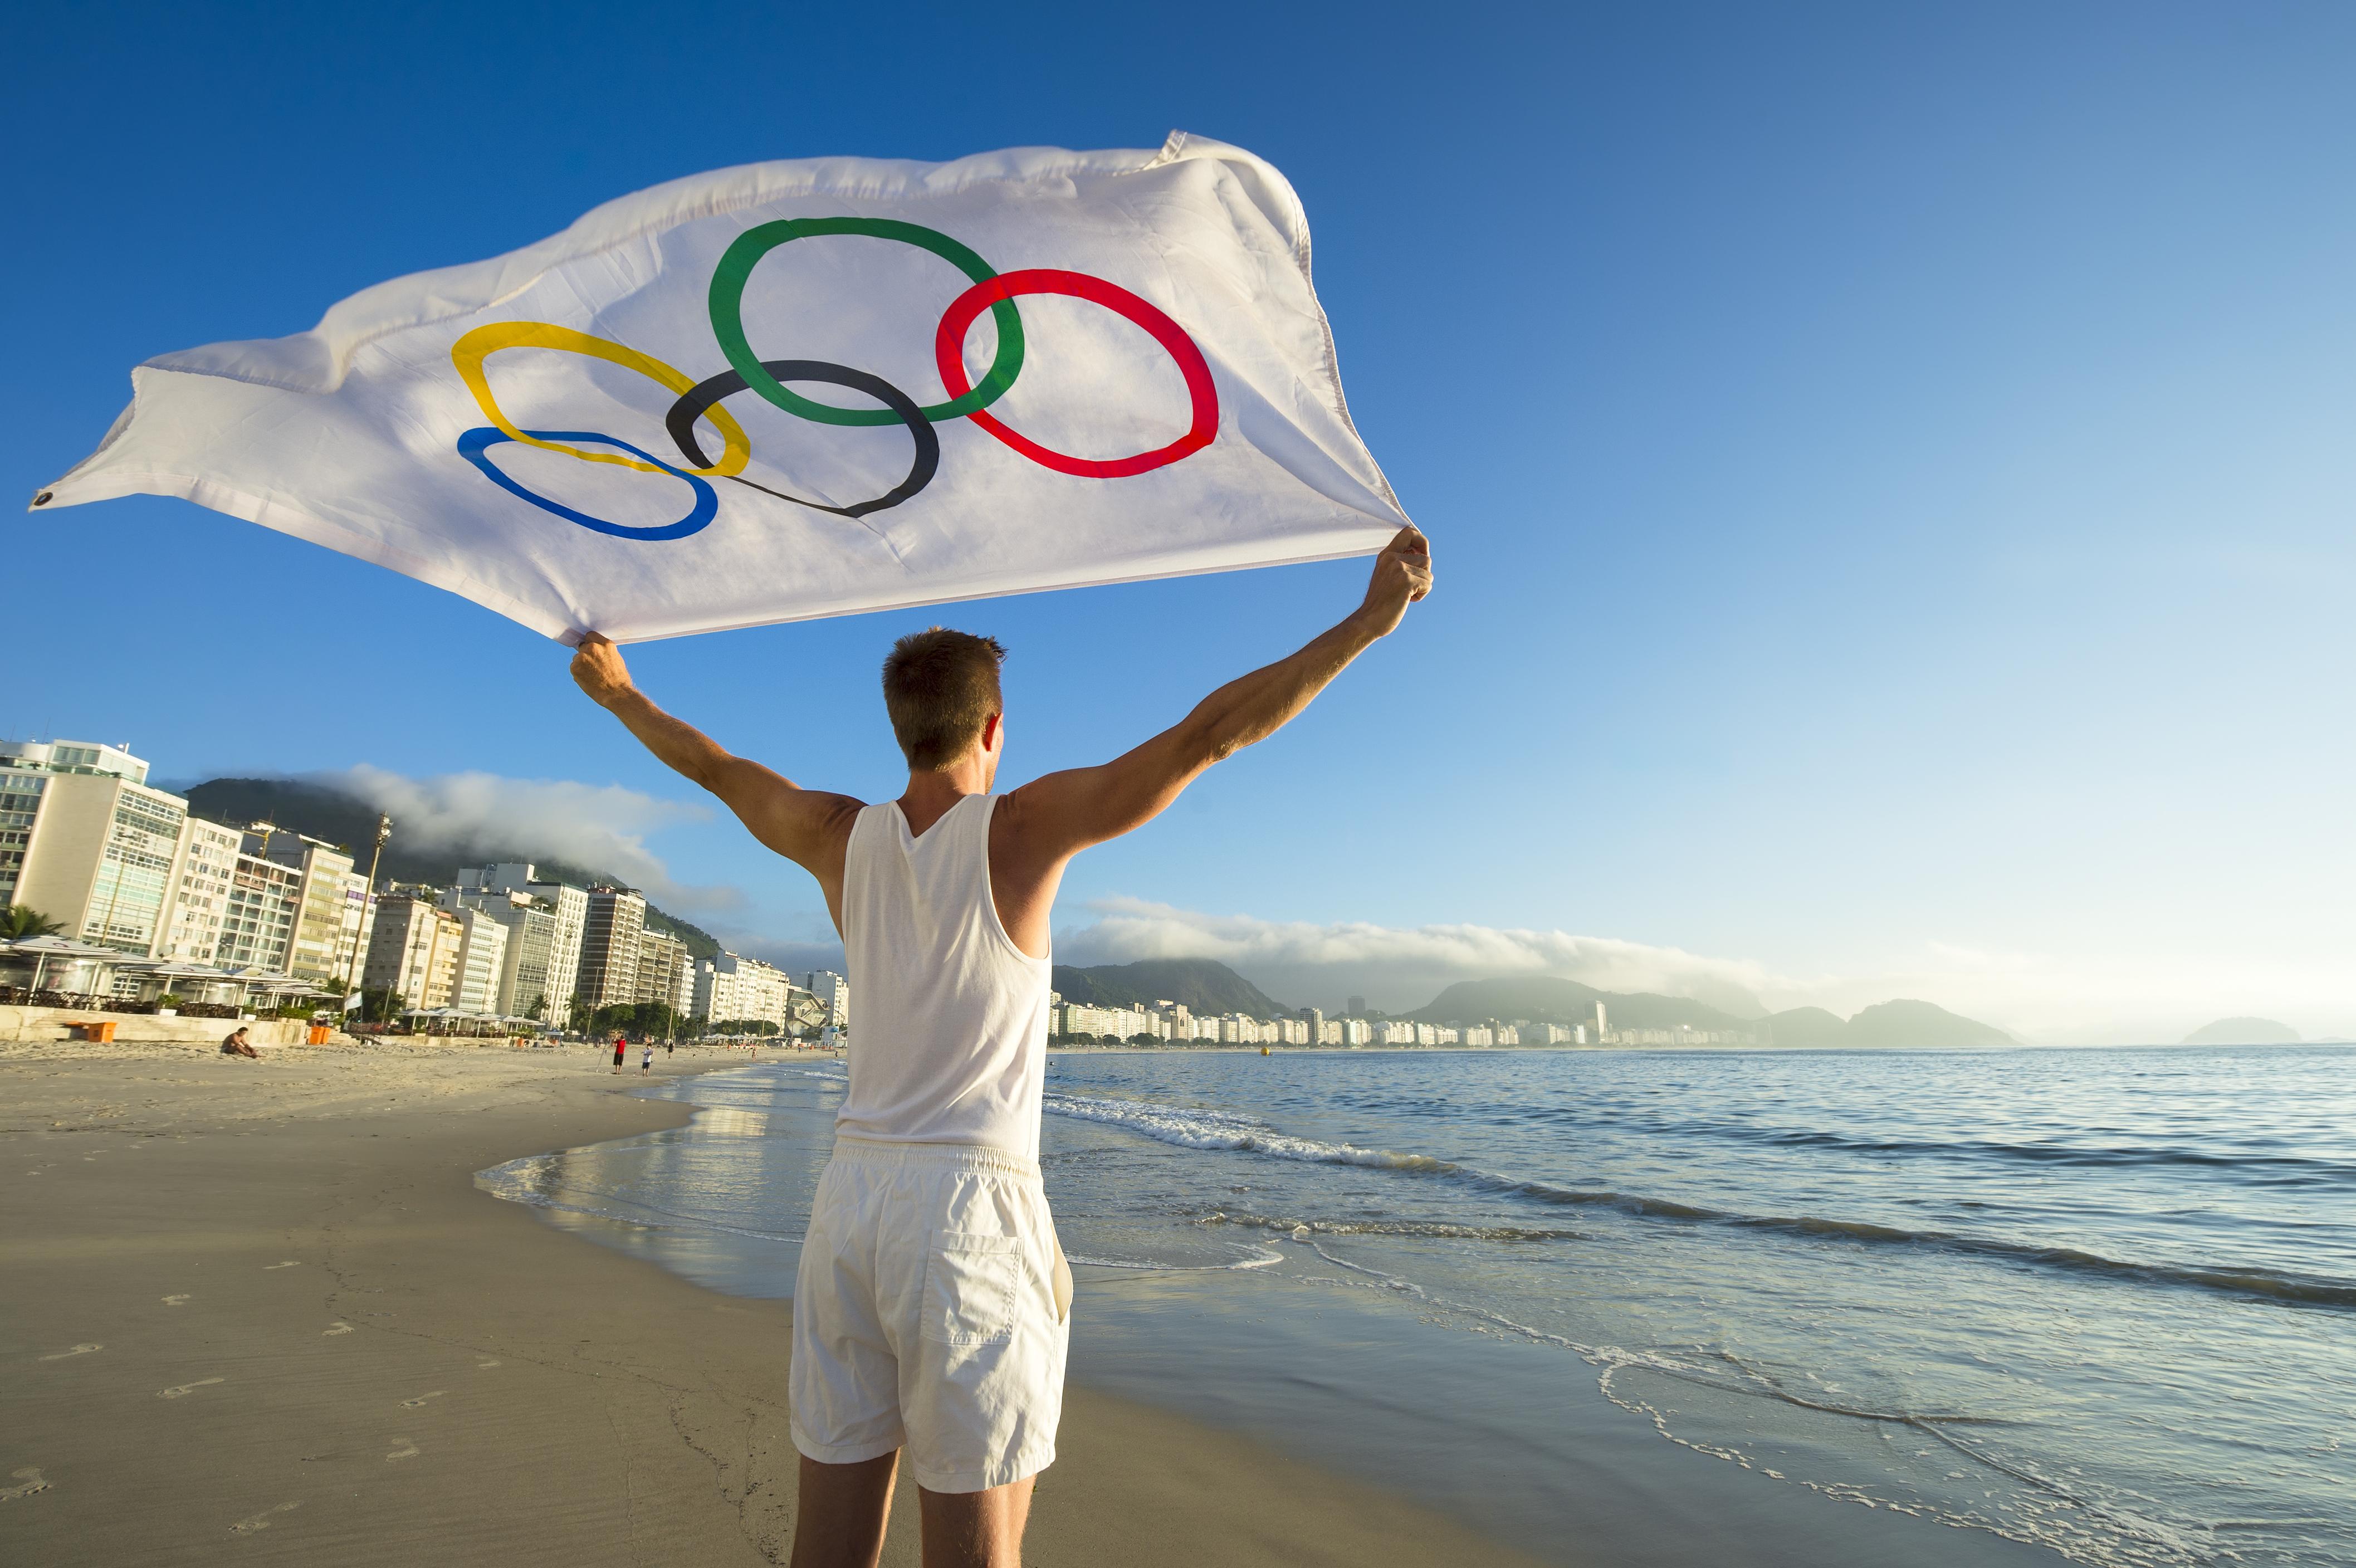 A híres Copacabana strand. Fotó: lazyllama / Shutterstock.com